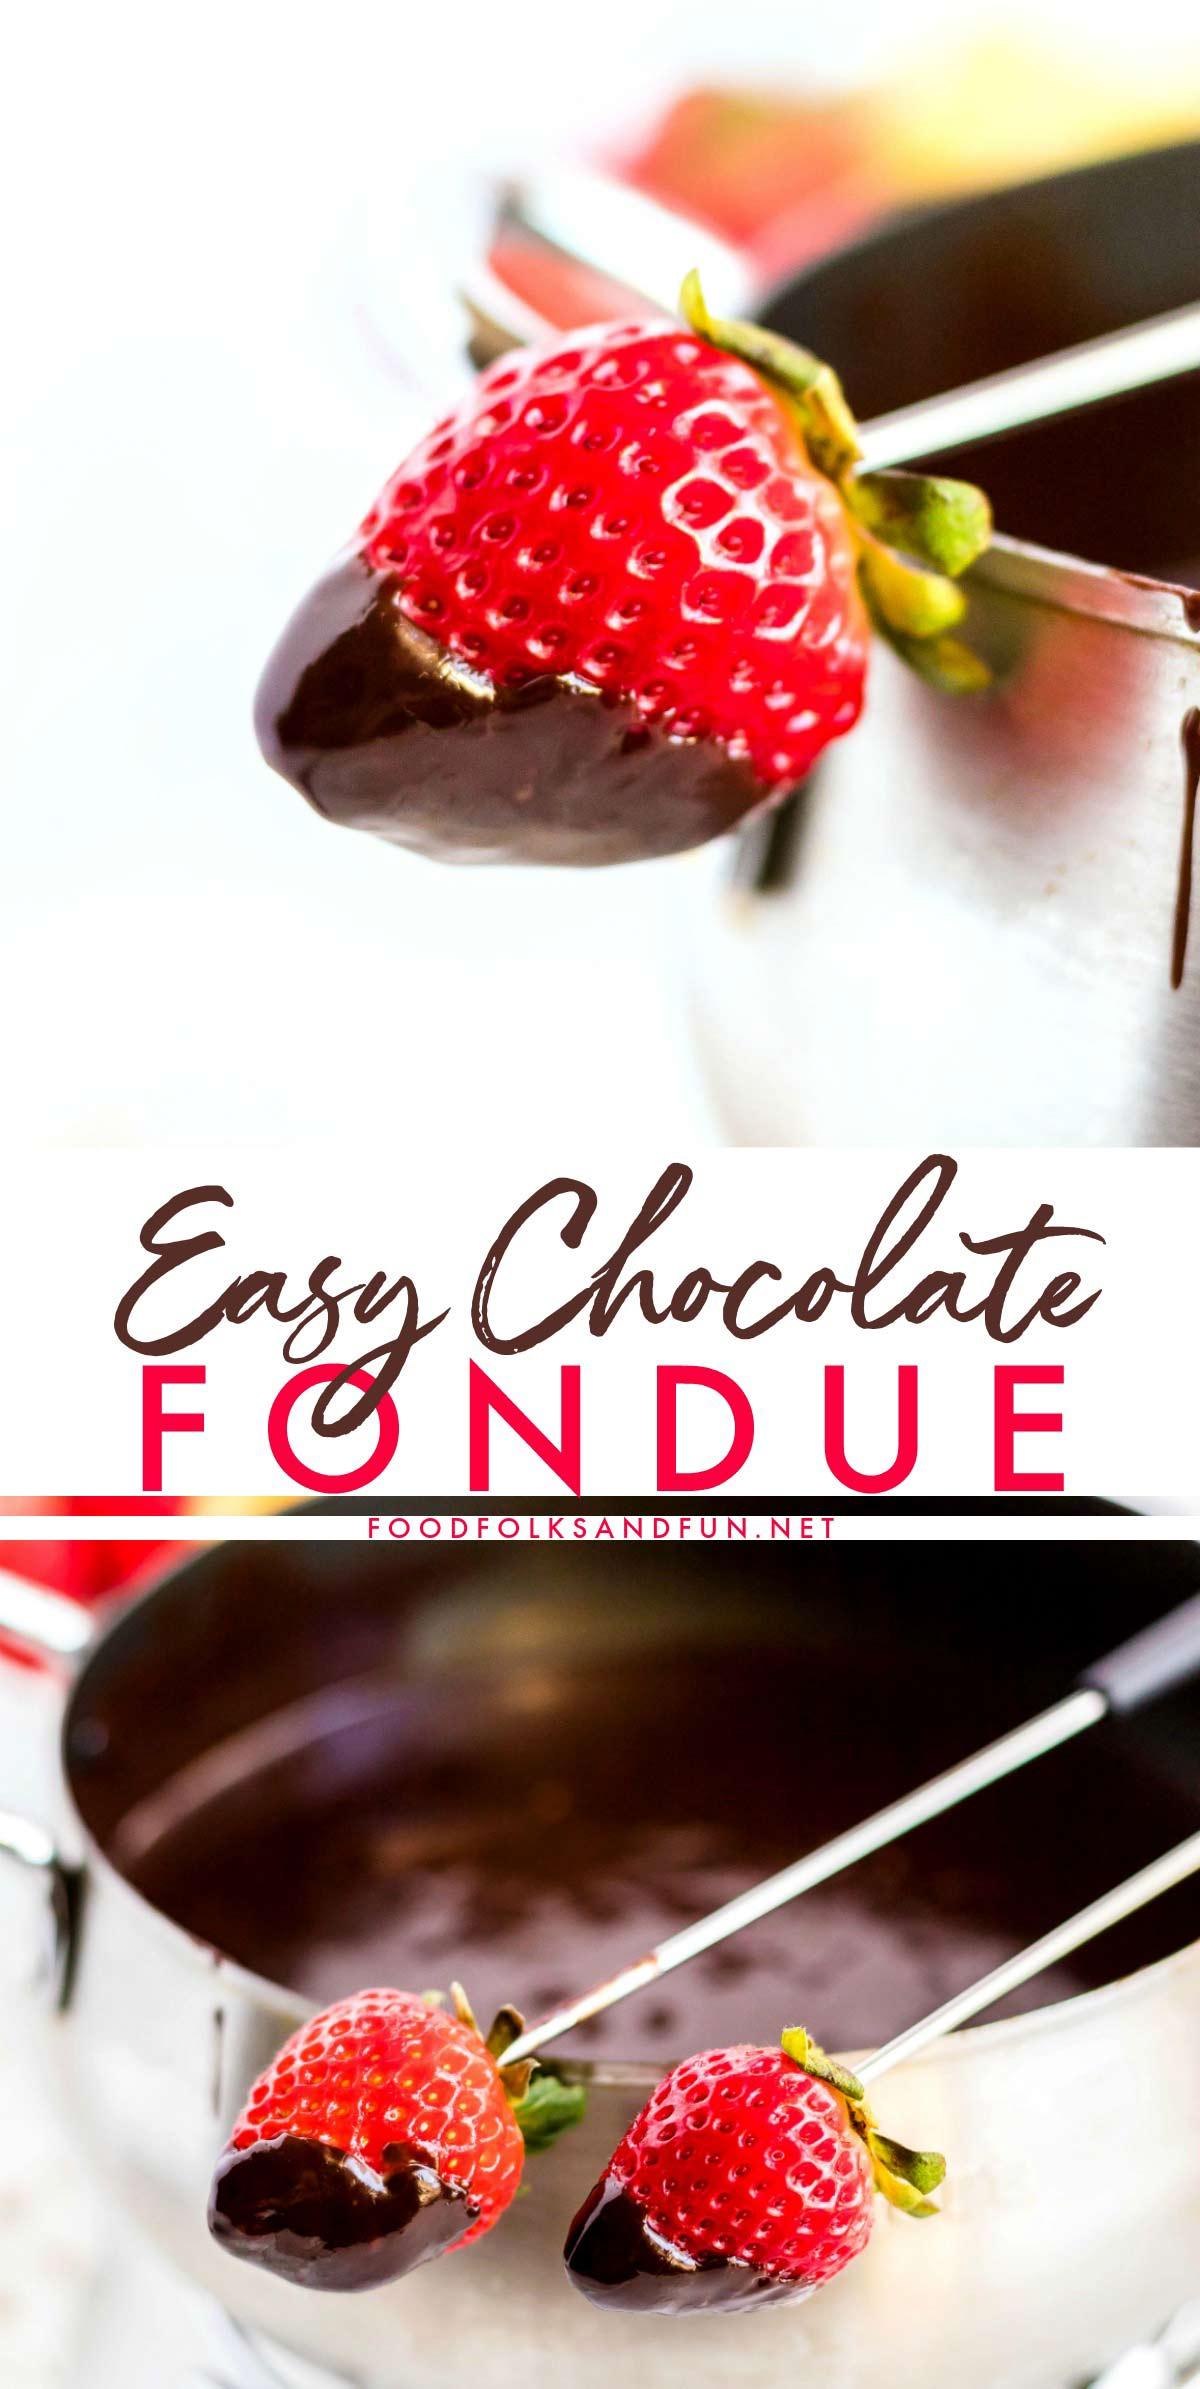 Velvety Chocolate Fondue recipe via @foodfolksandfun